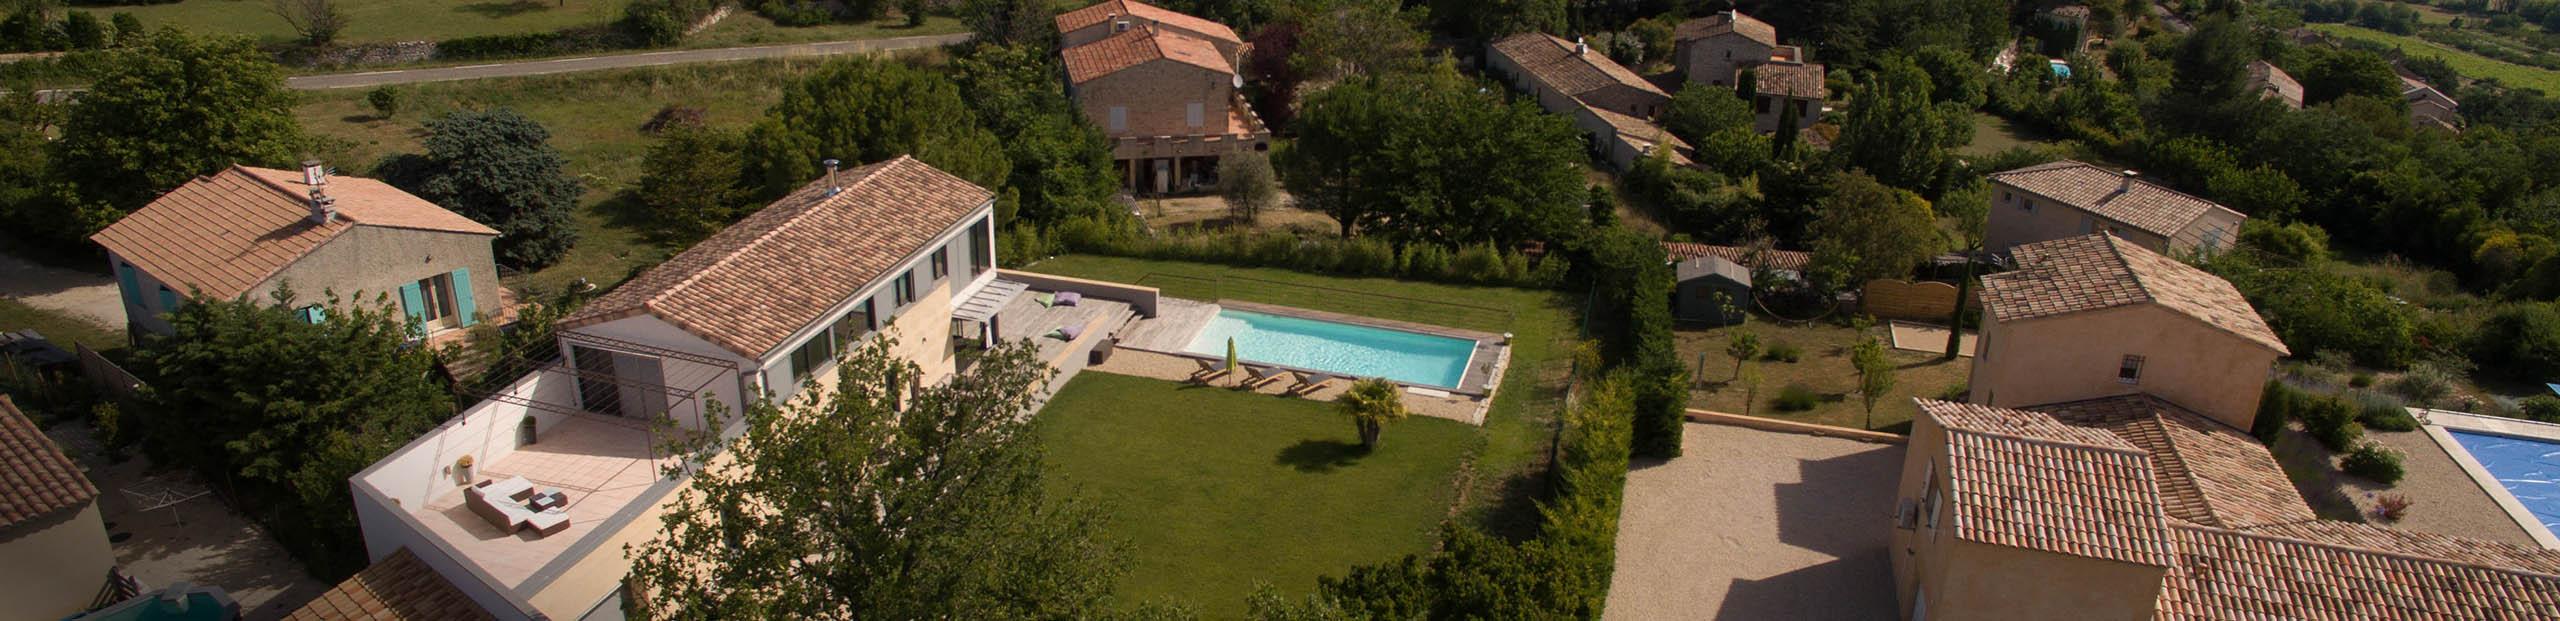 Home | Swimming Pools Magiline dedans Self Piscine